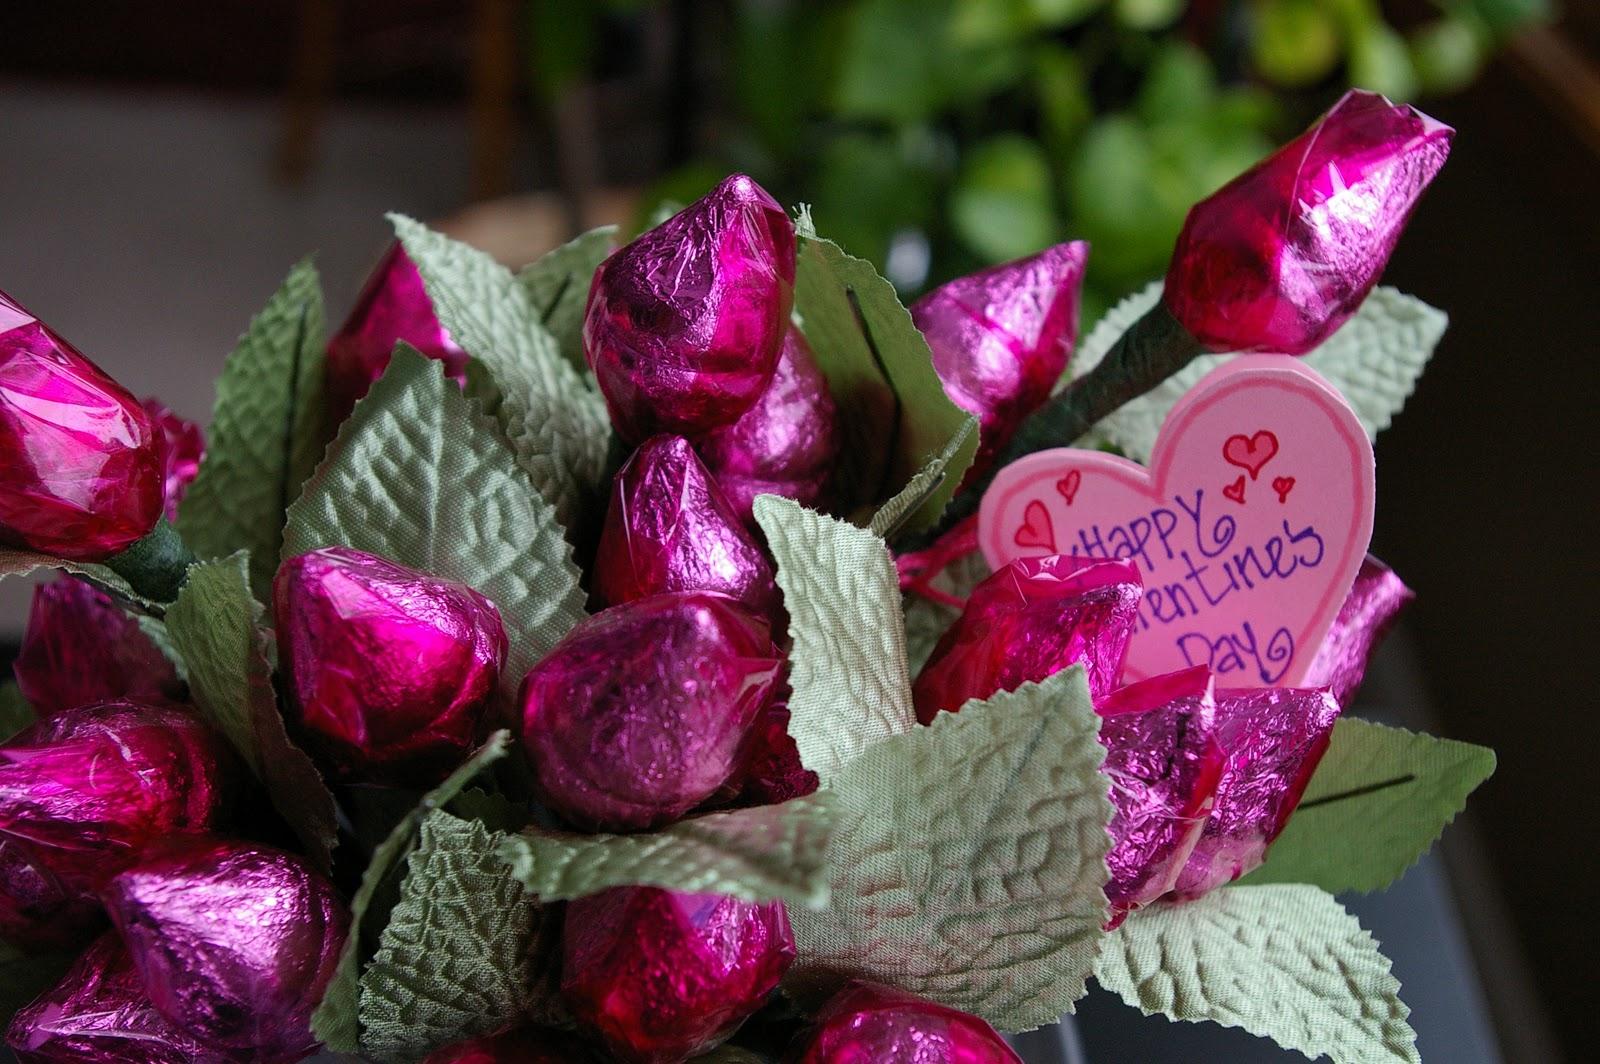 Fathers Day 2012 Magazine Hershey Kiss Rose Valentines